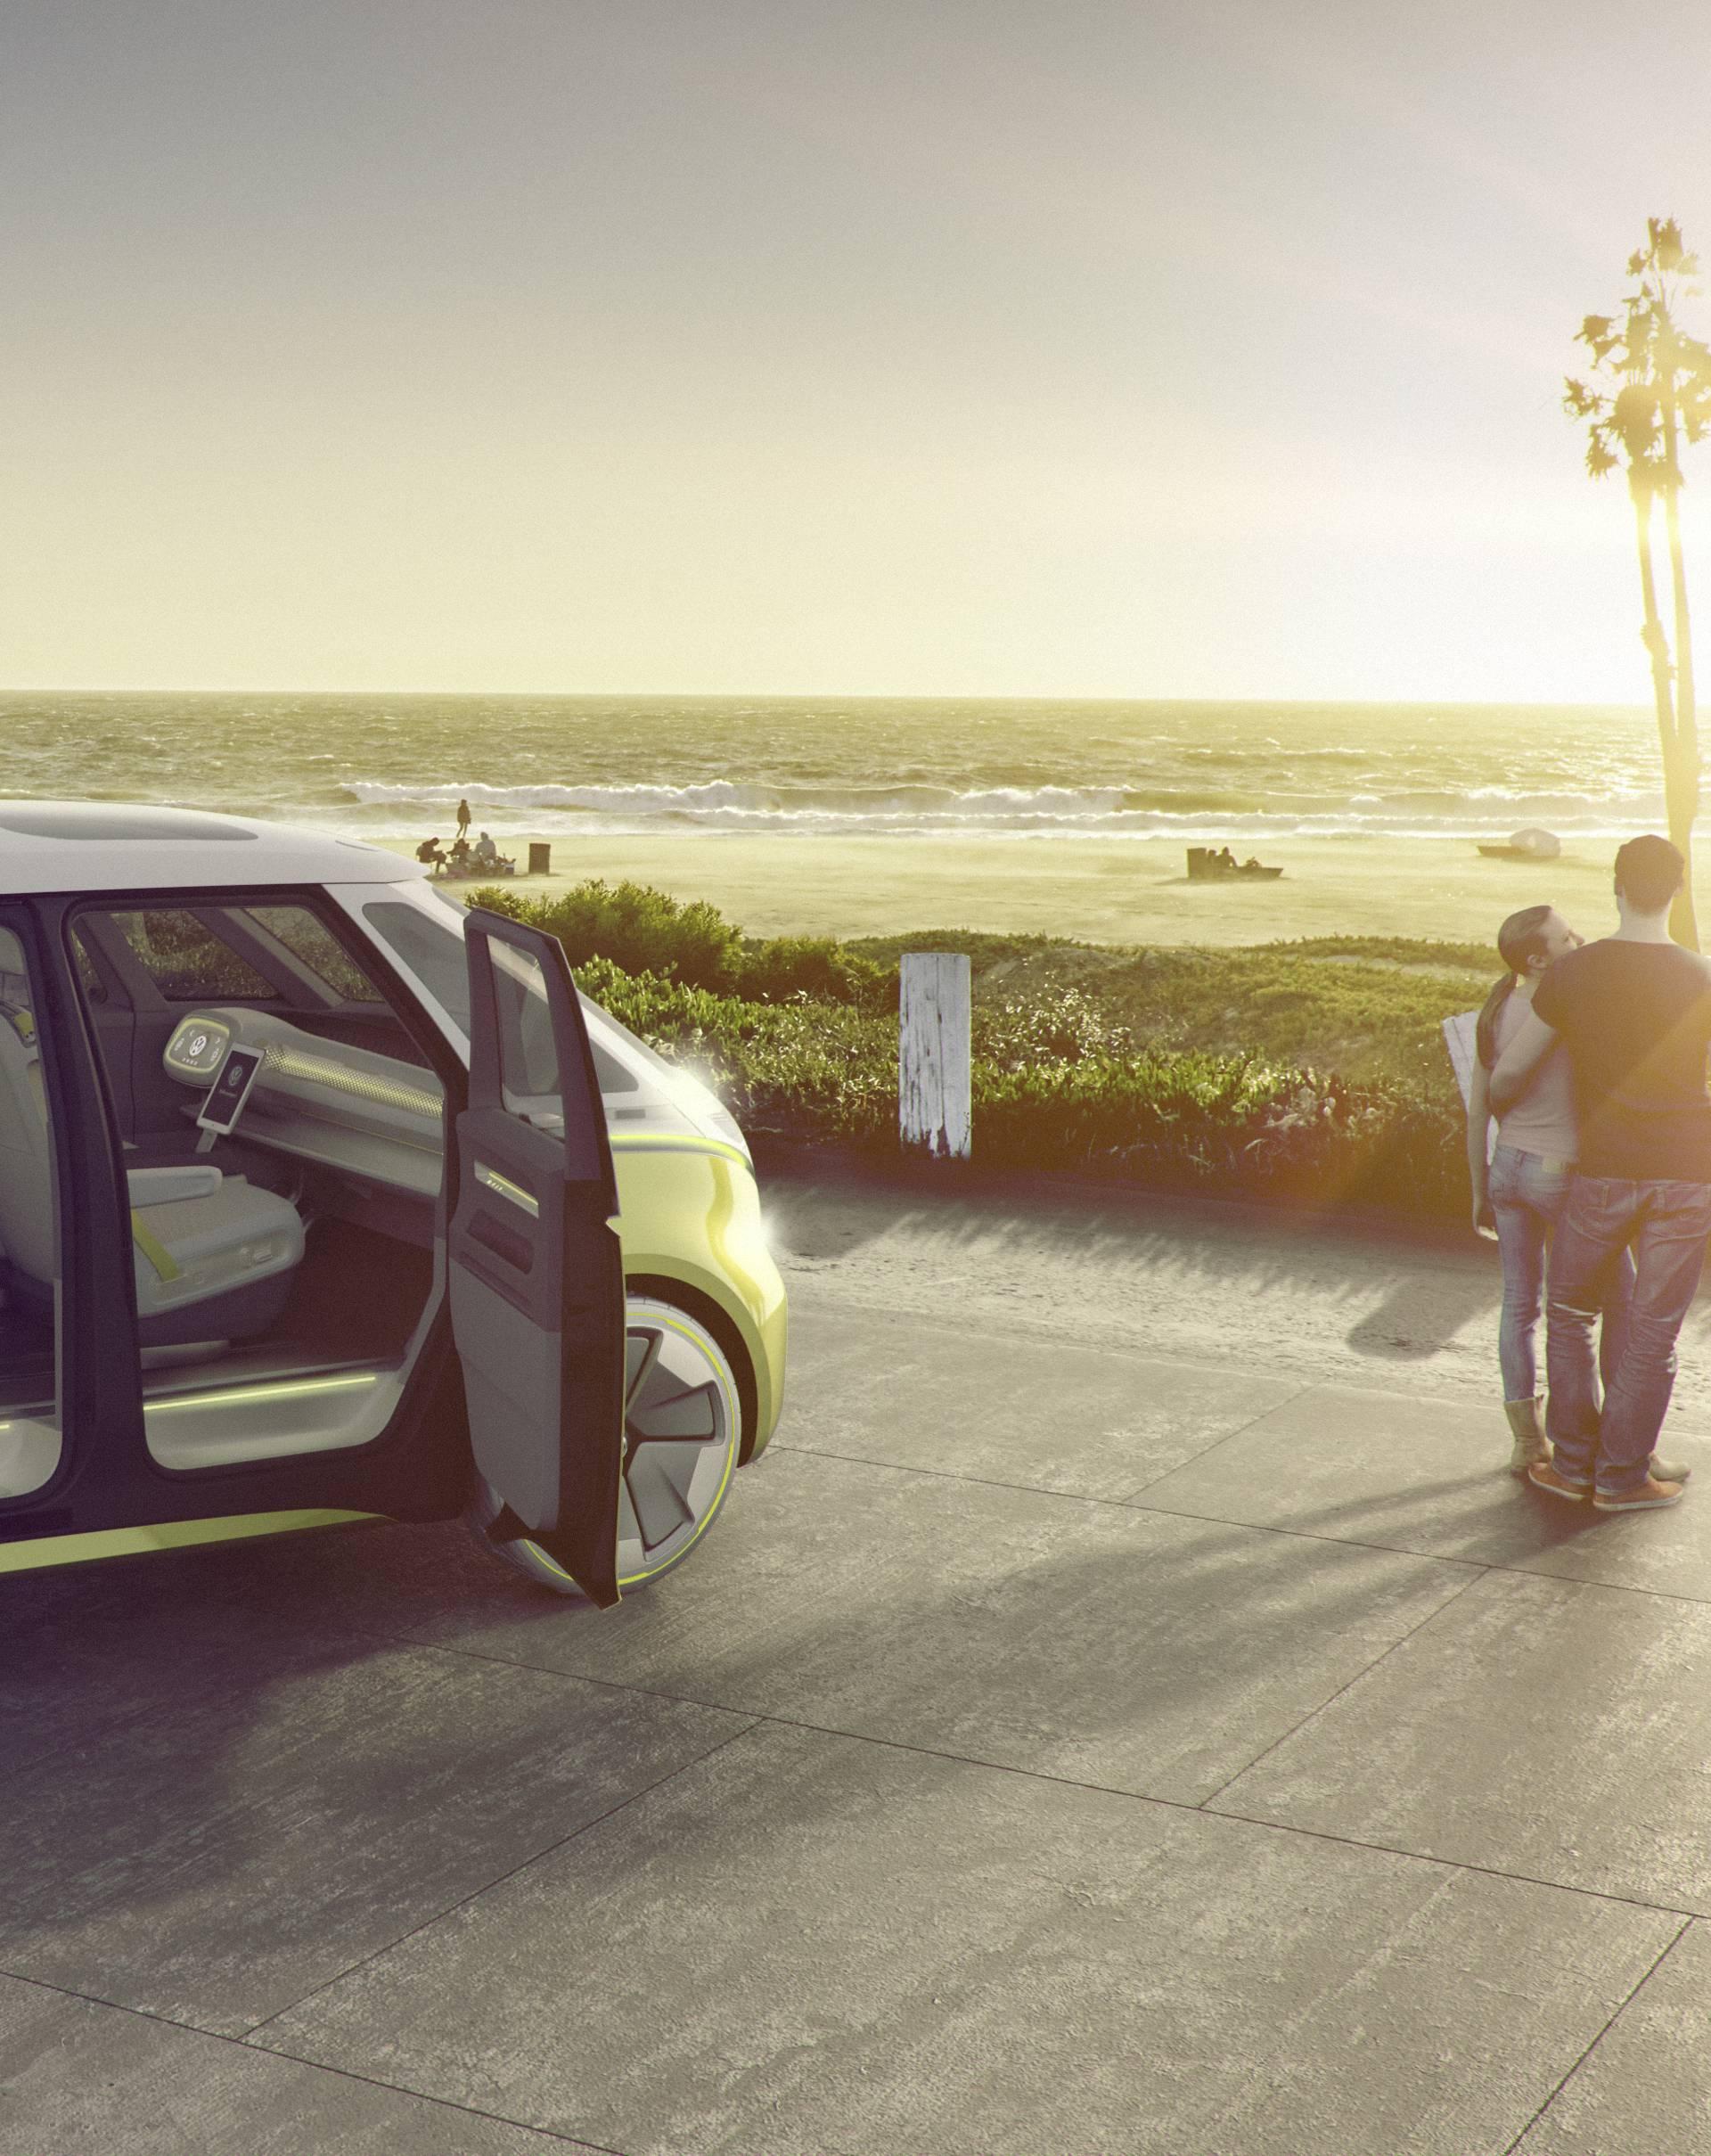 Volkswagenov pametni kombi znat će prepoznati svog vozača